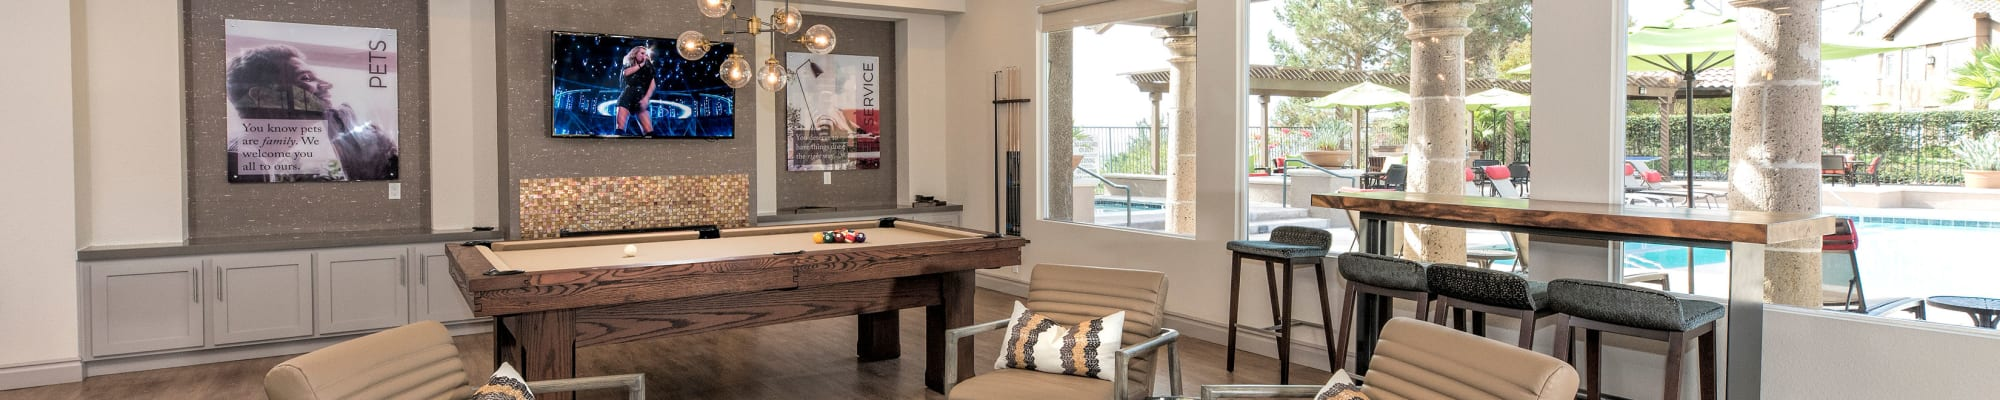 Amenities at Paloma Summit Condominium Rentals in Foothill Ranch, California